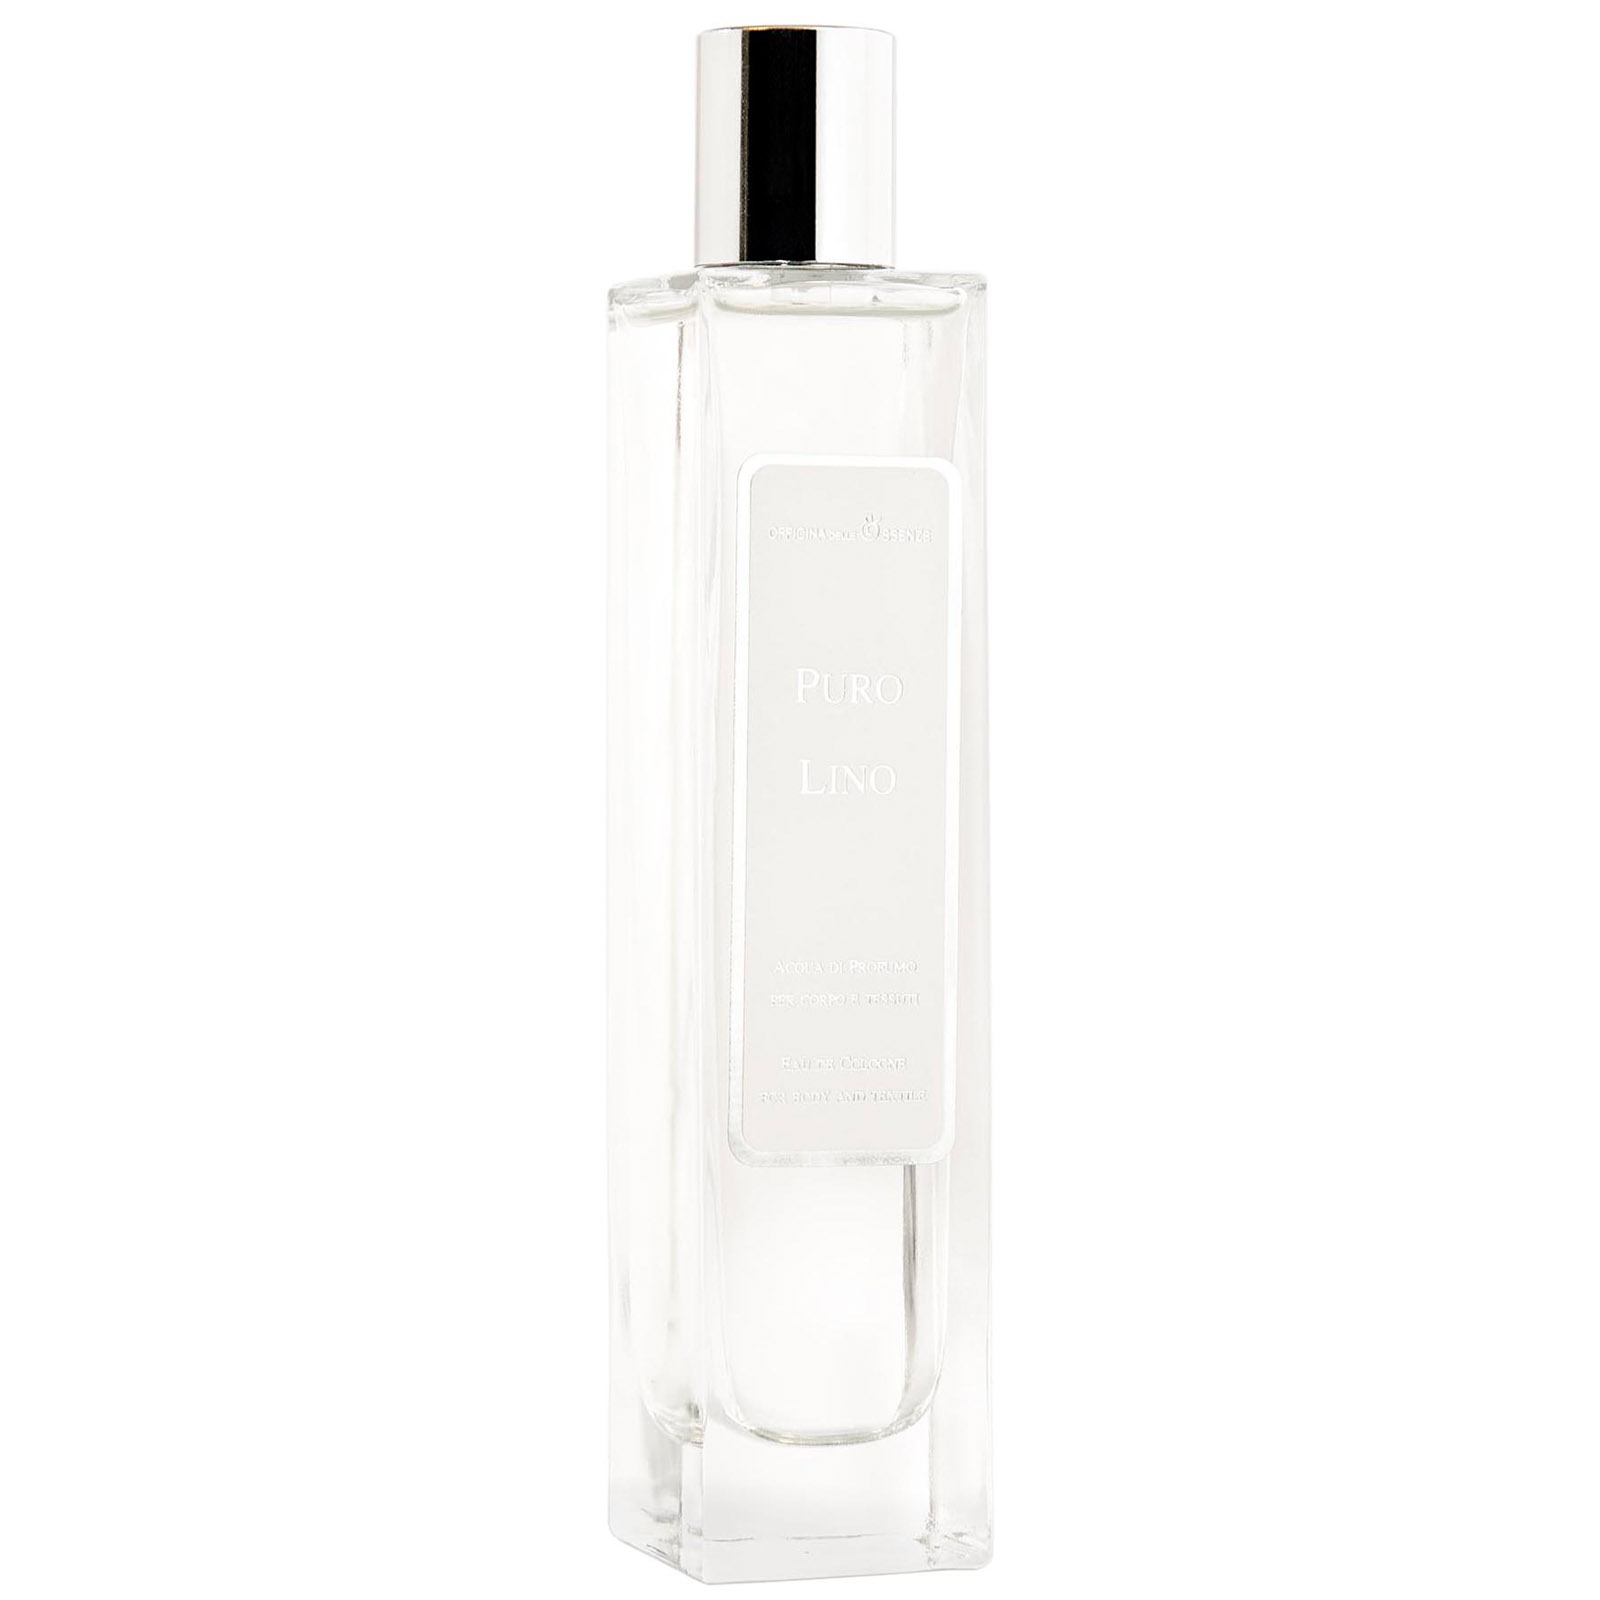 Puro lino profumo eau de cologne 100 ml